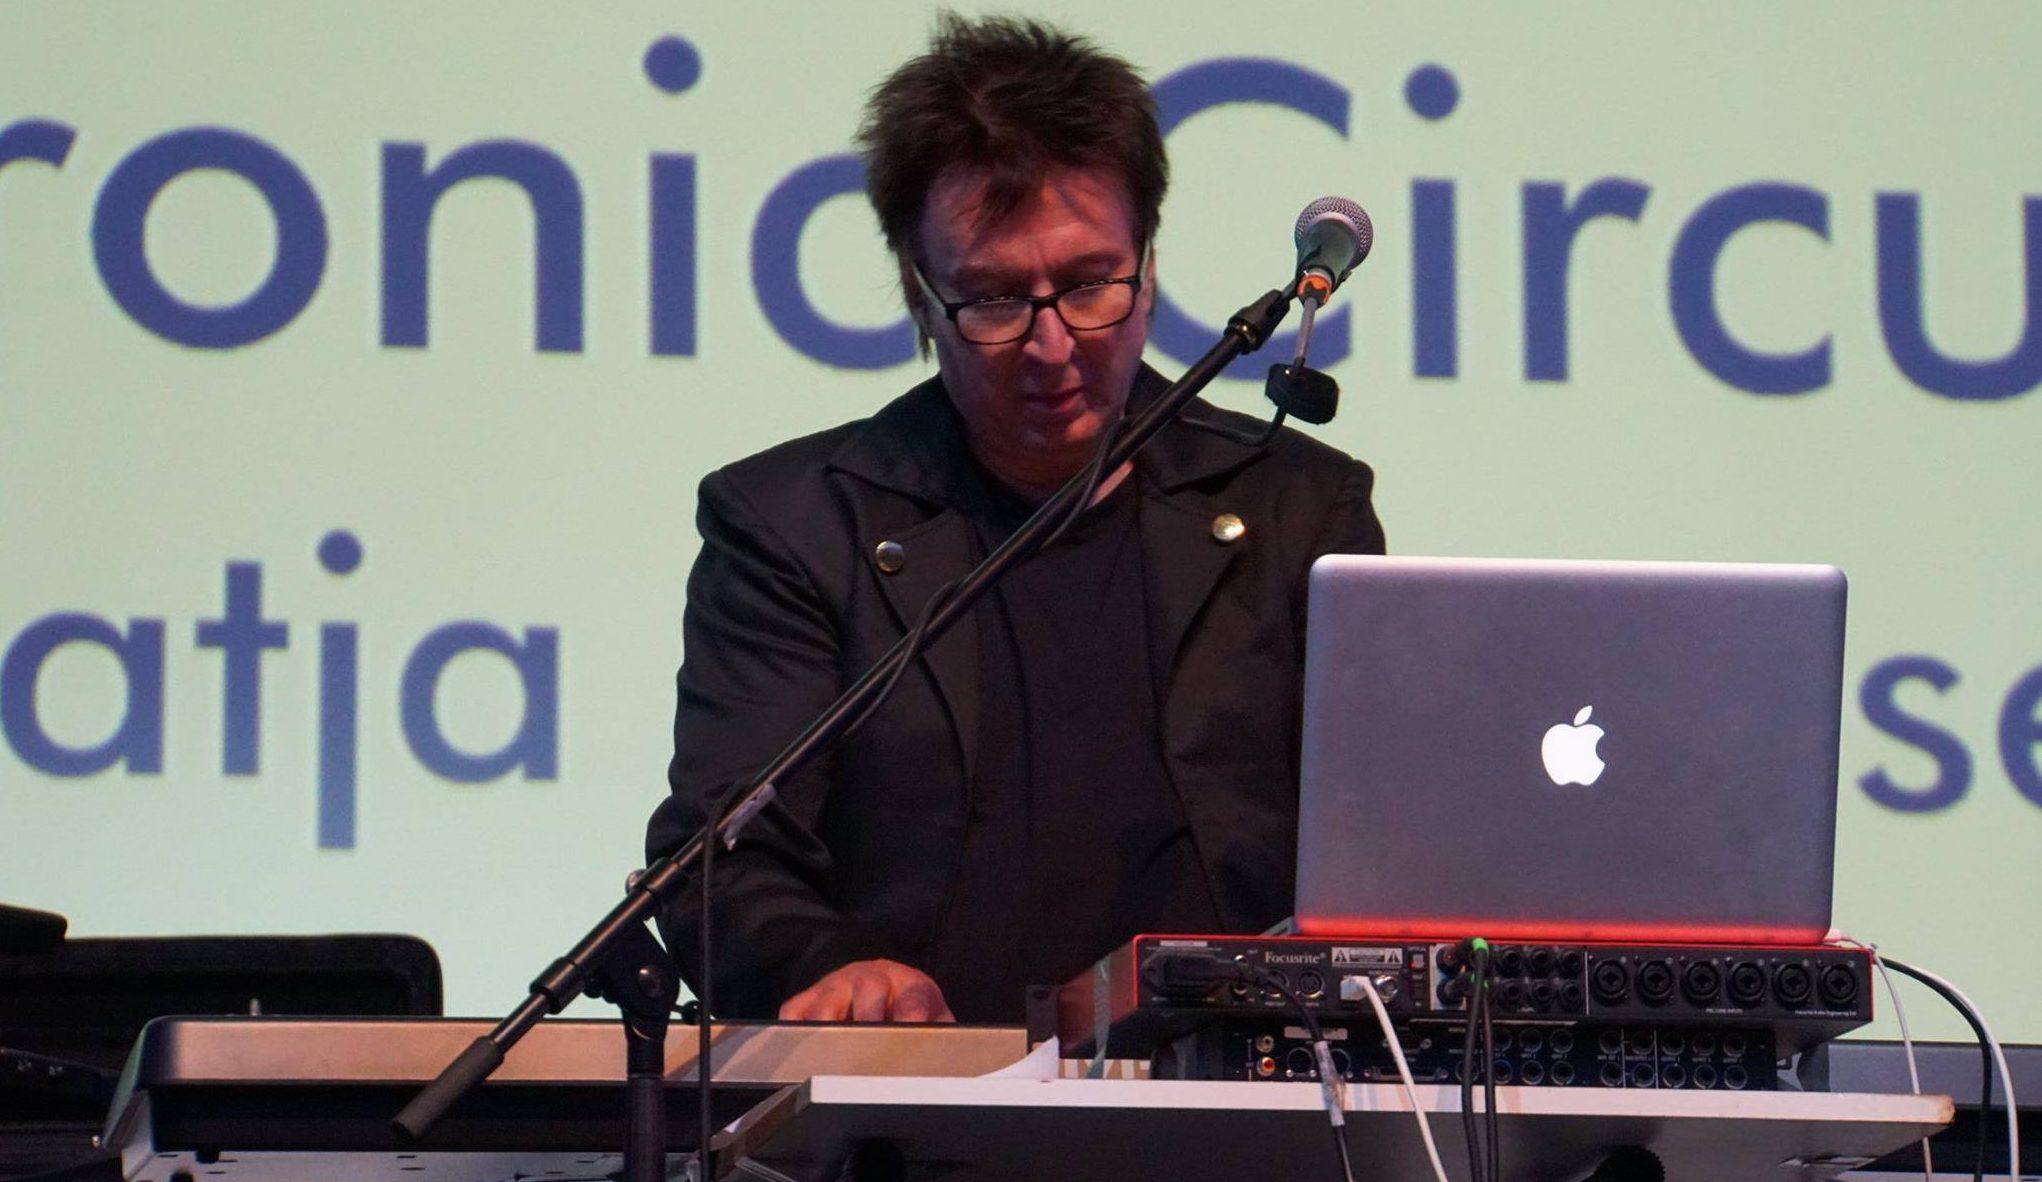 Chris Payne - Electronic Circus (Dusseldorf)